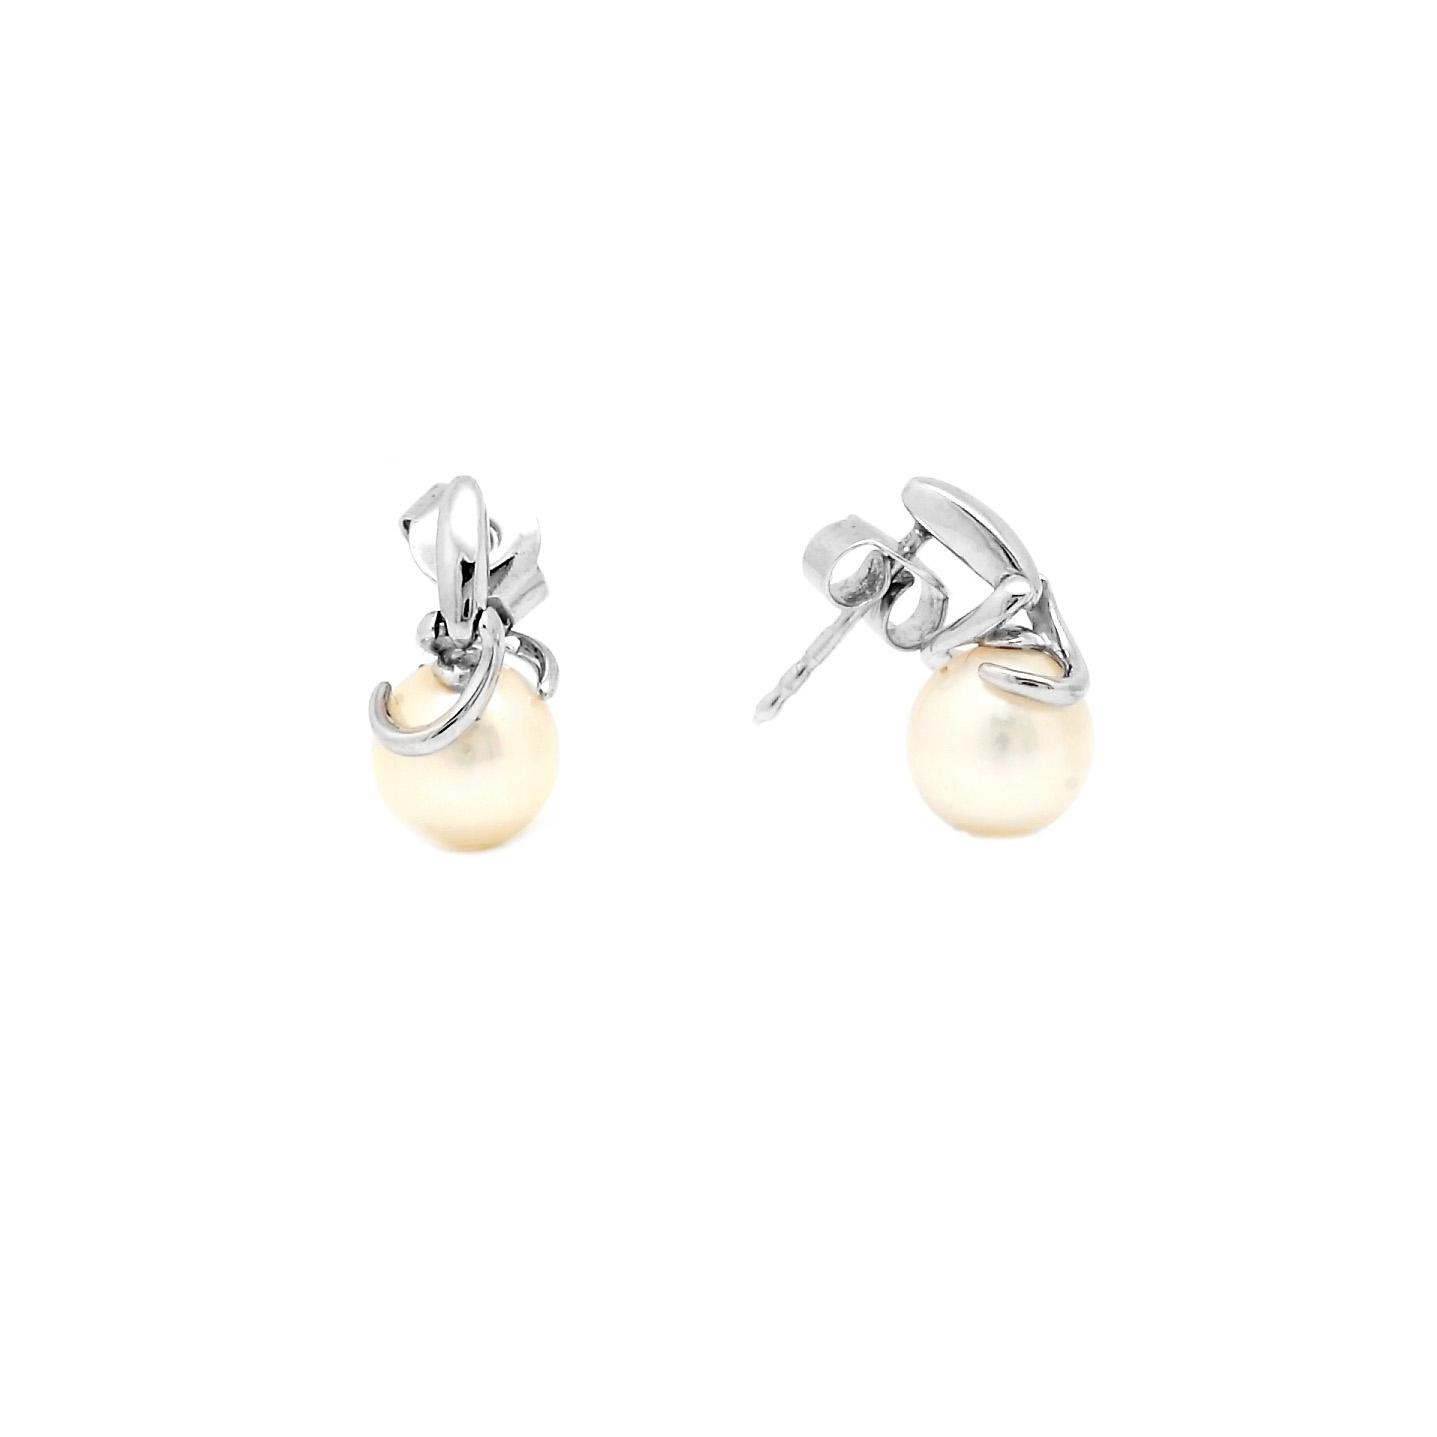 Zlaté náušnice EILEN s perlou